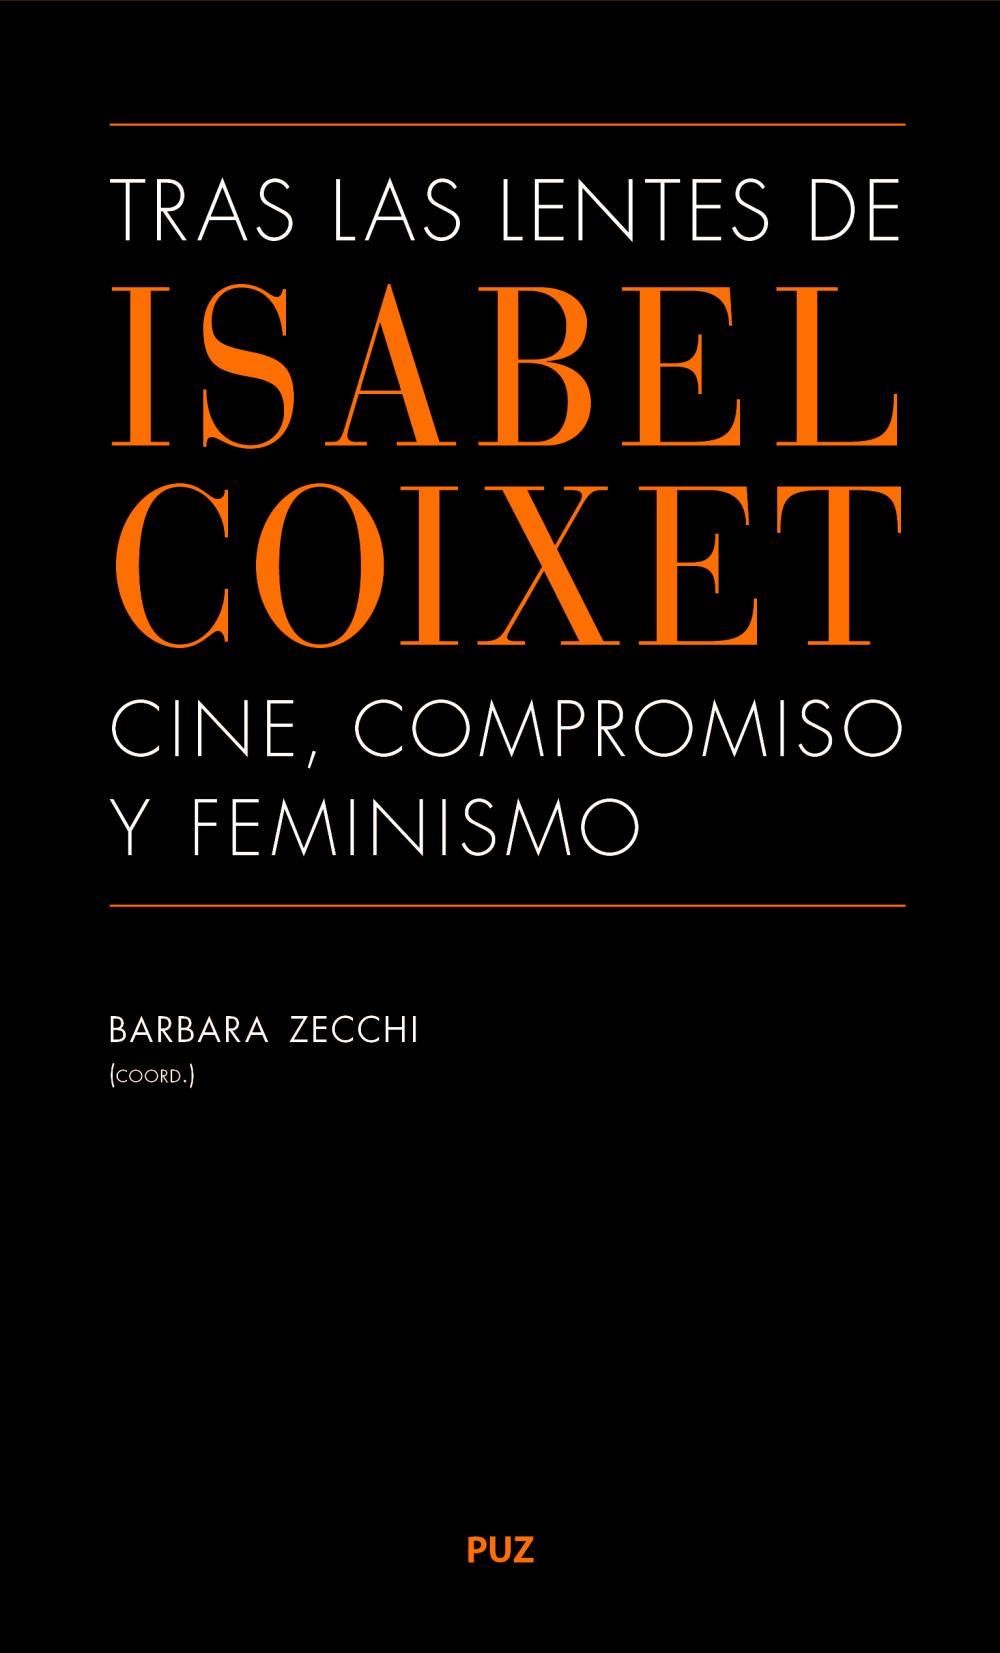 Tras las lentes de Isabel Coixet: